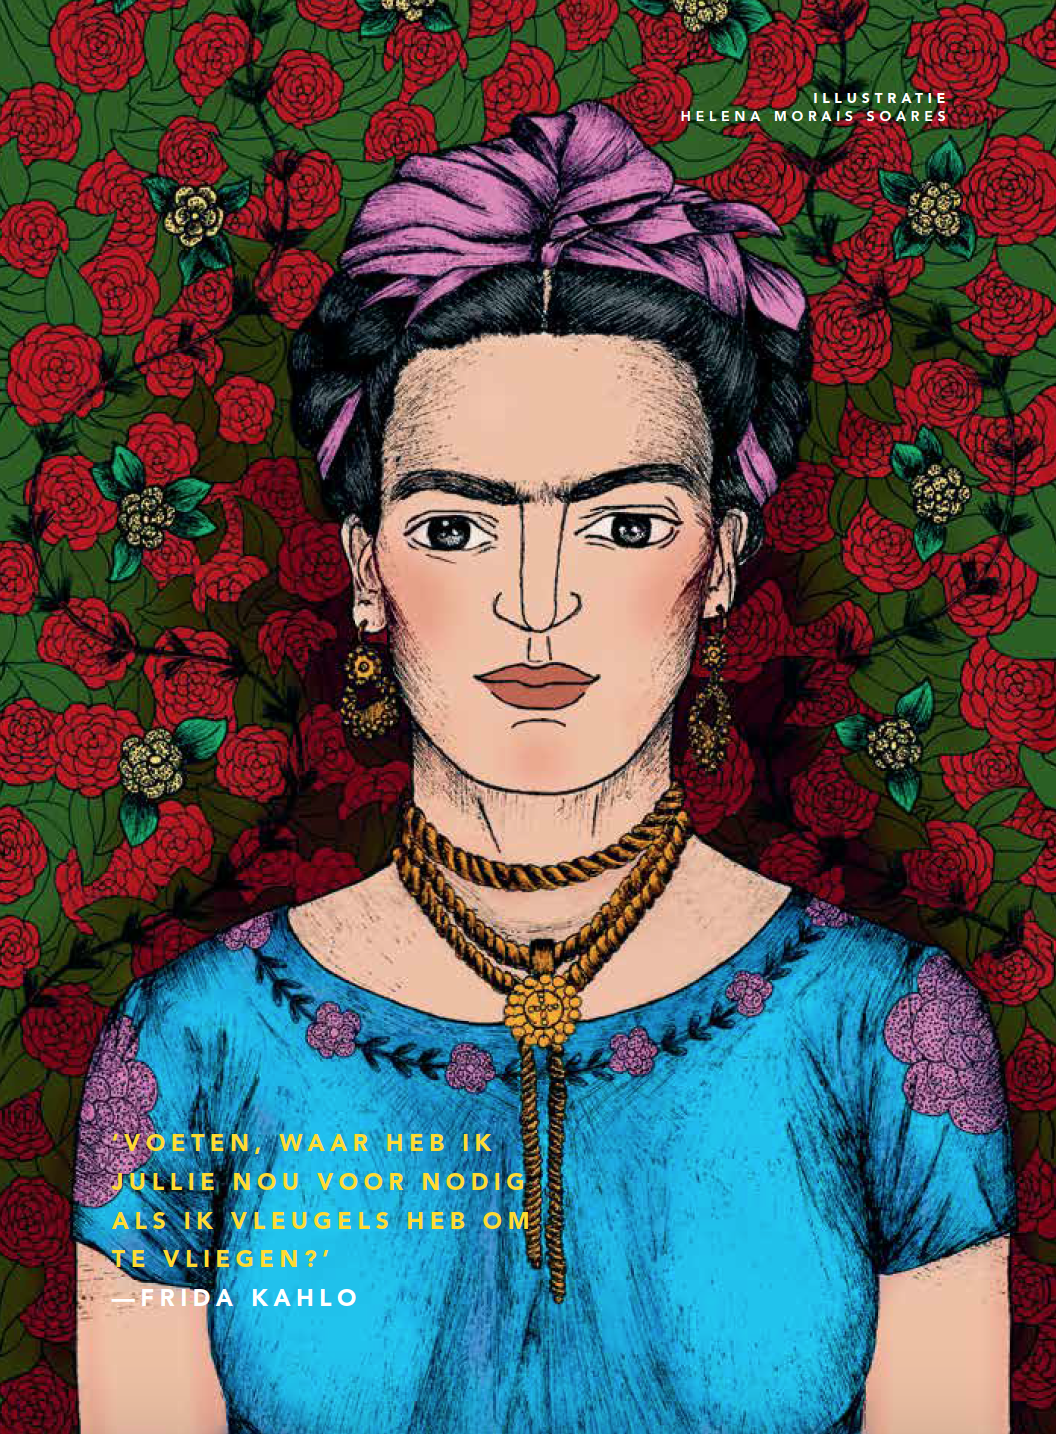 Frida Kahlo afbeelding